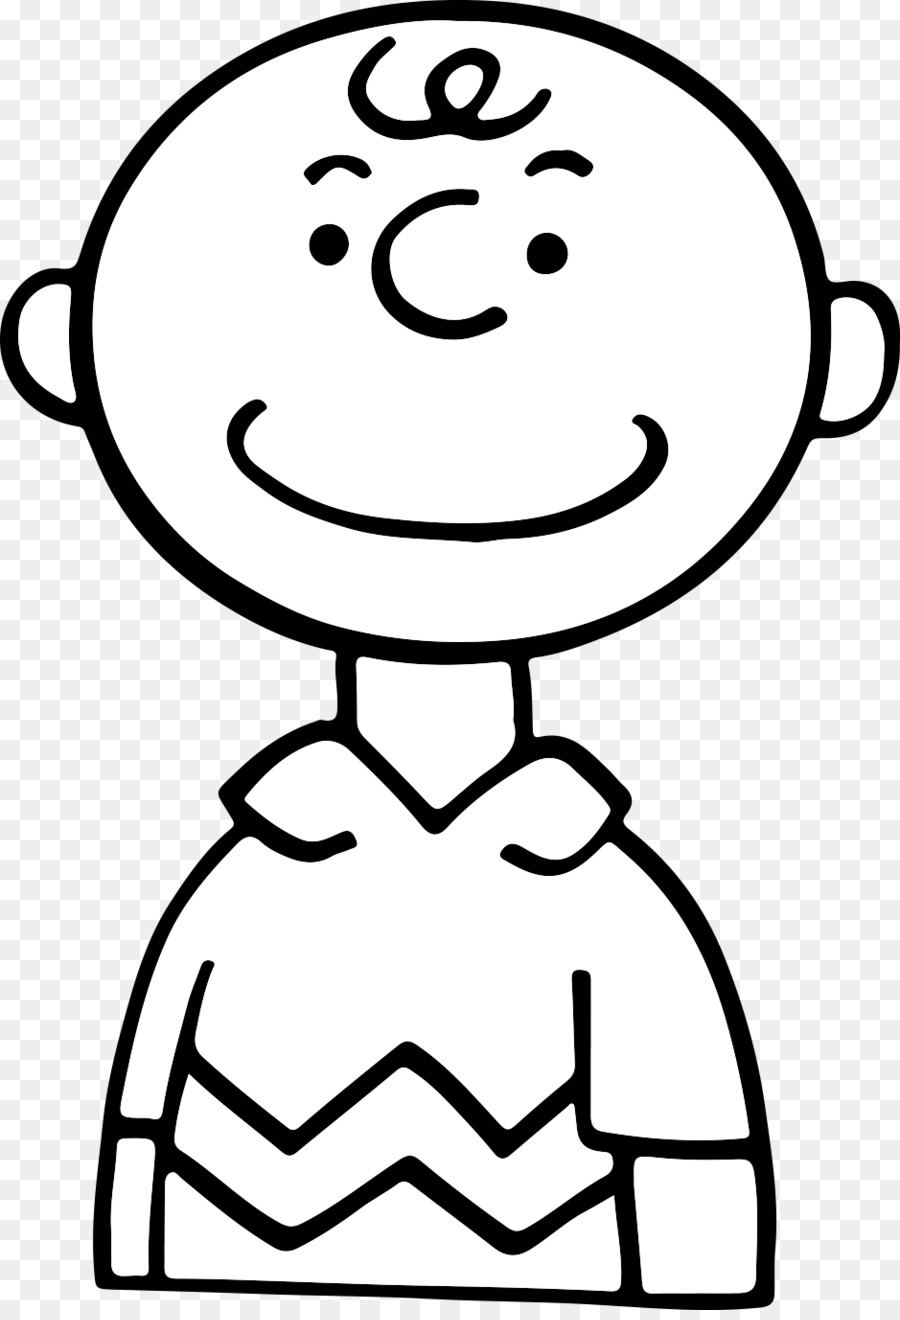 Dibujo de Charlie Brown Línea de arte Snoopy - charlie brown png ...